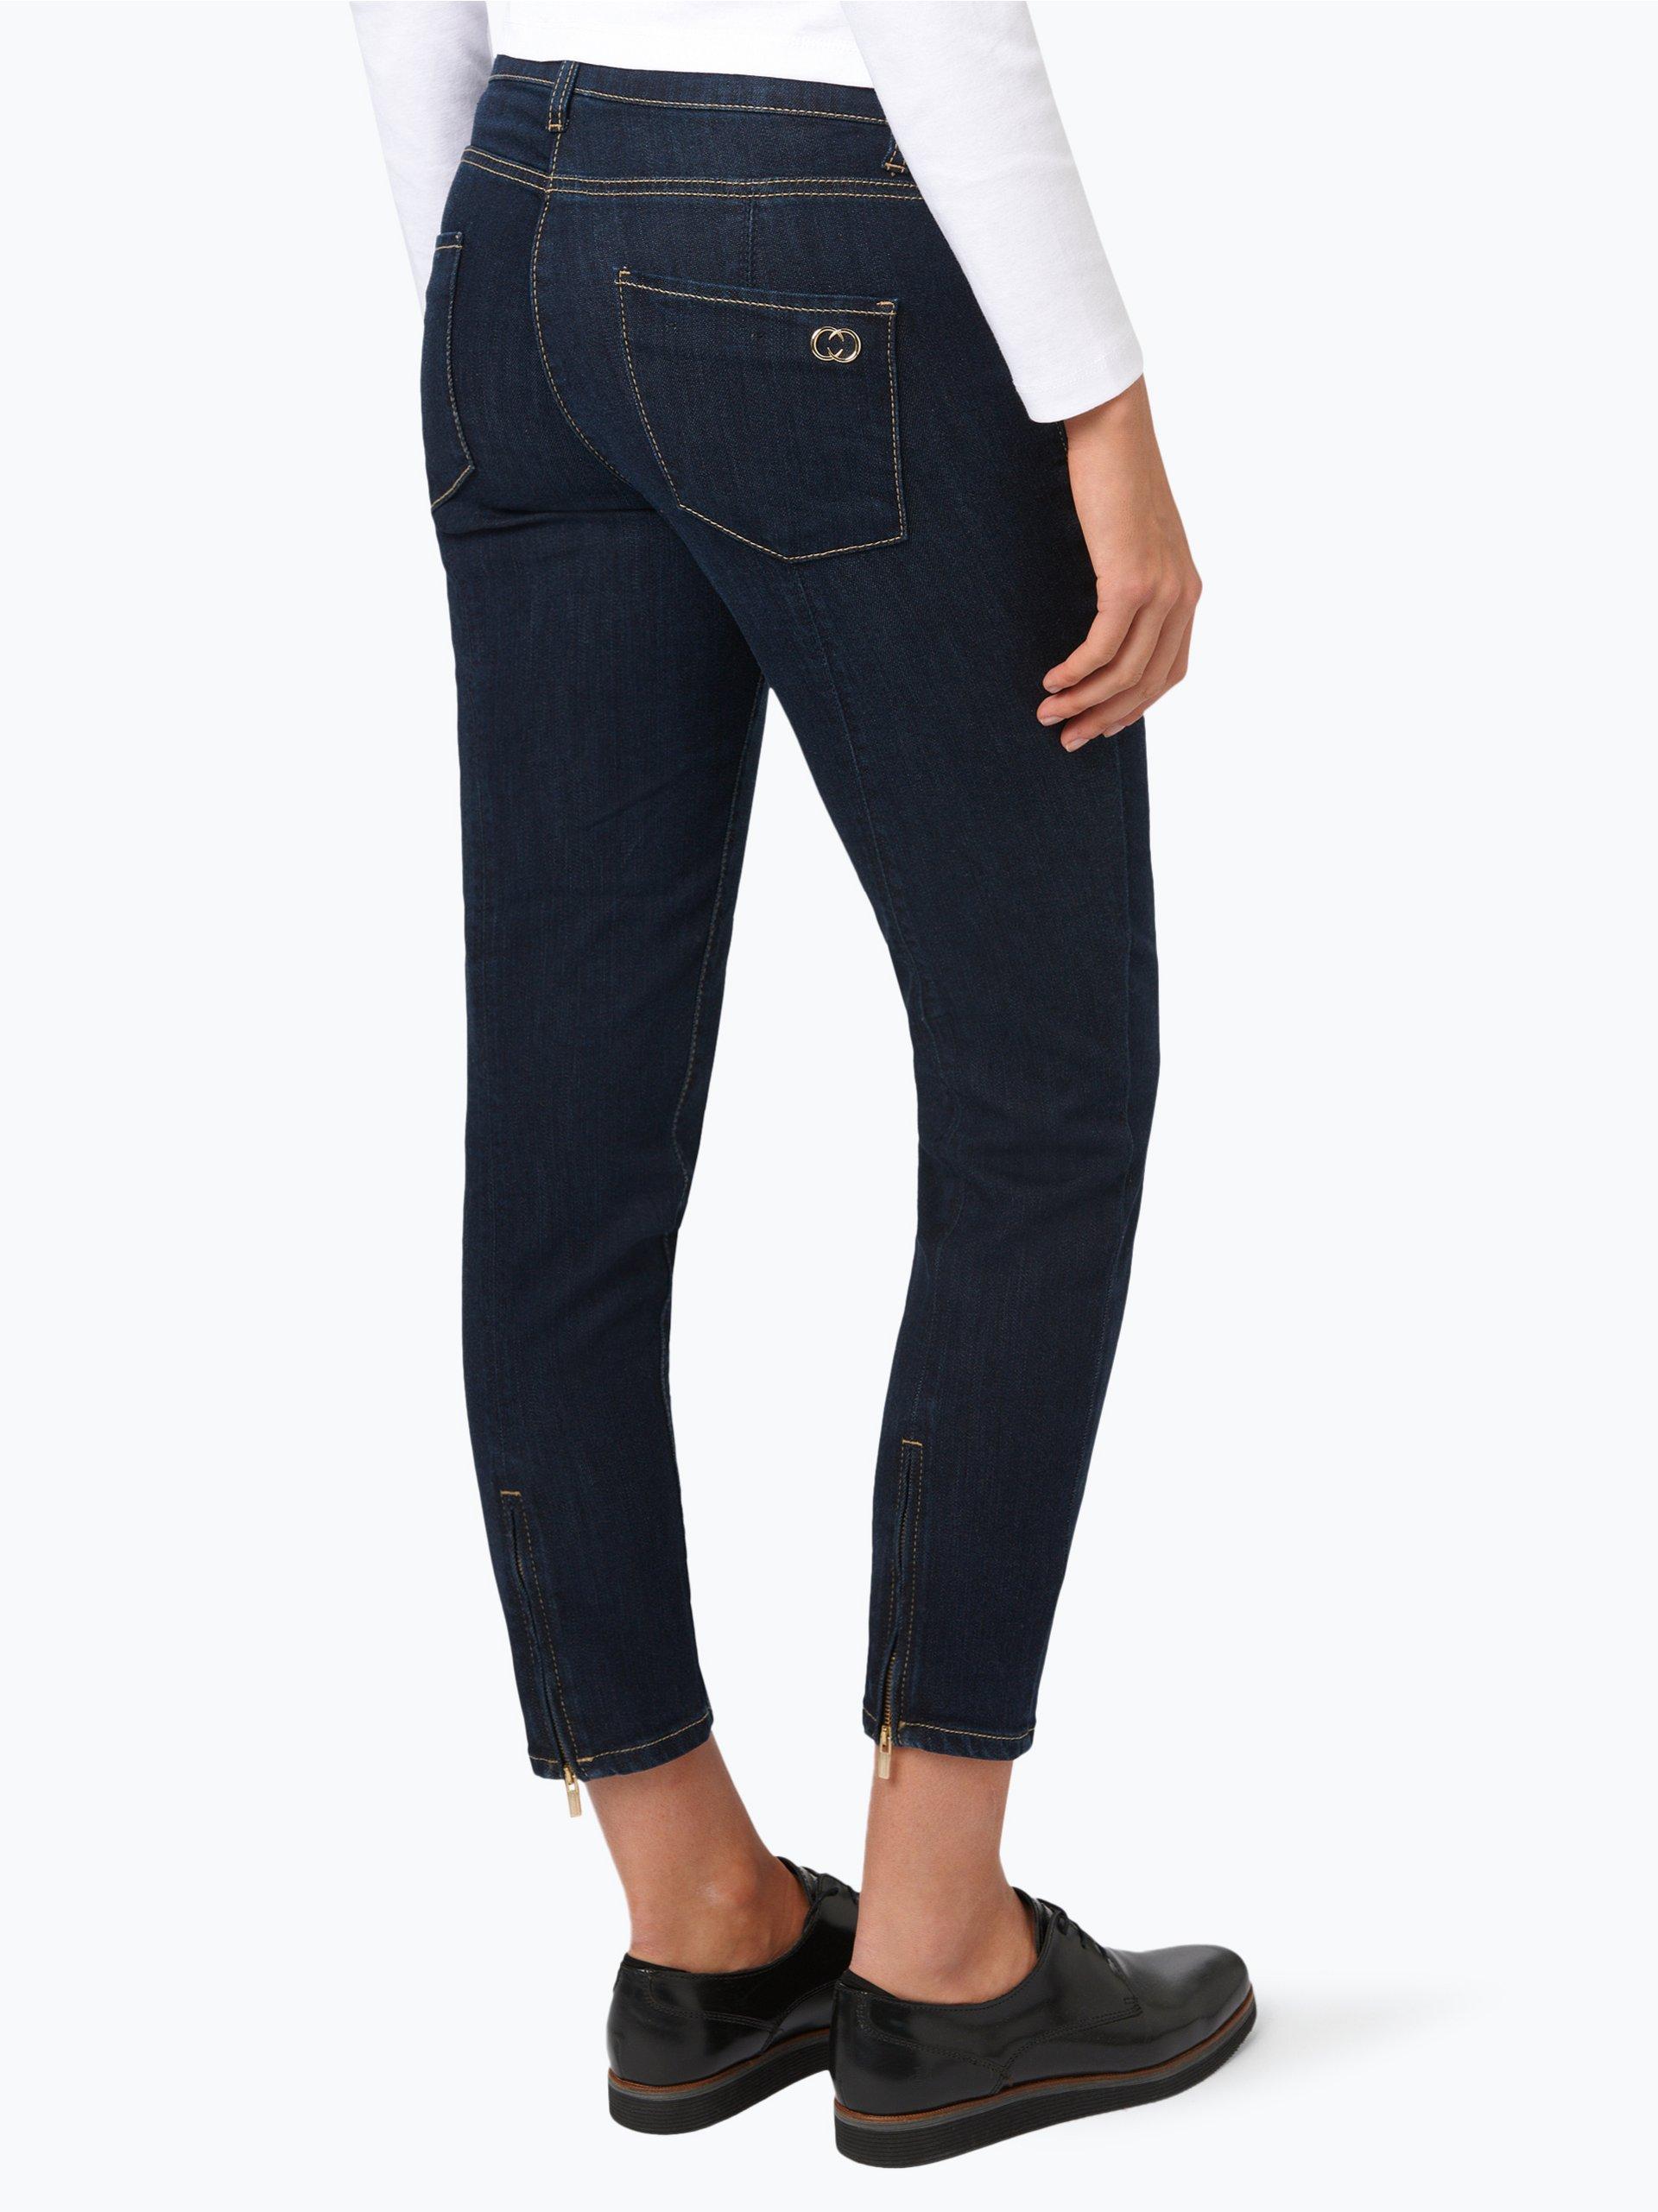 cambio damen jeans piera rinsed uni online kaufen vangraaf com. Black Bedroom Furniture Sets. Home Design Ideas